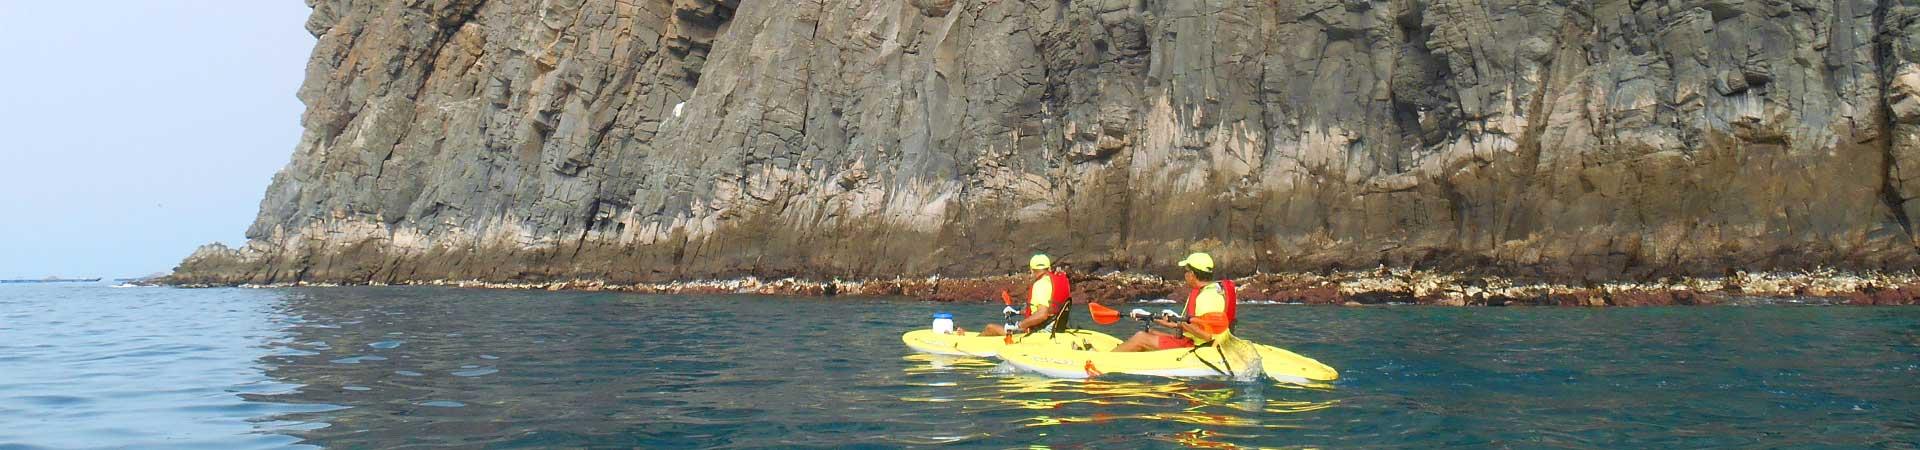 https://www.goodmorningtenerife.com/wp-content/uploads/2015/02/02_tenerife-snorkelling-kayaking_slide-1920x450.jpg